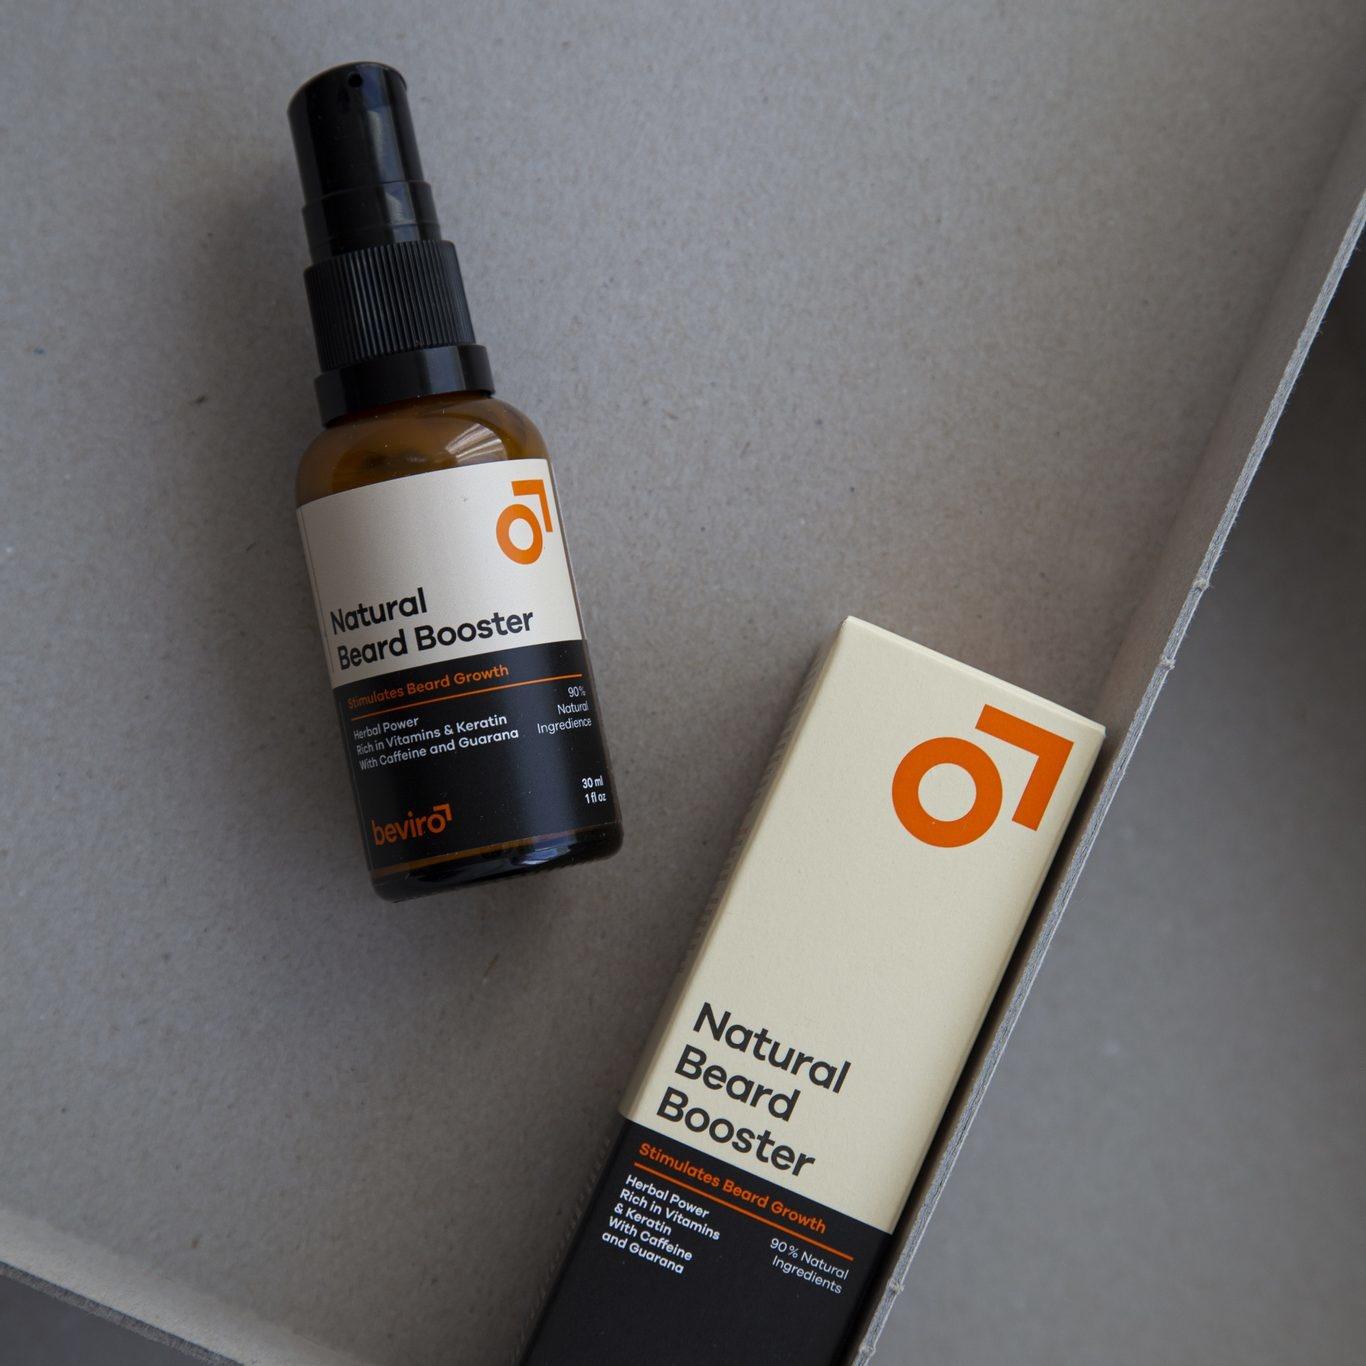 Beviro Natural Beard Booster